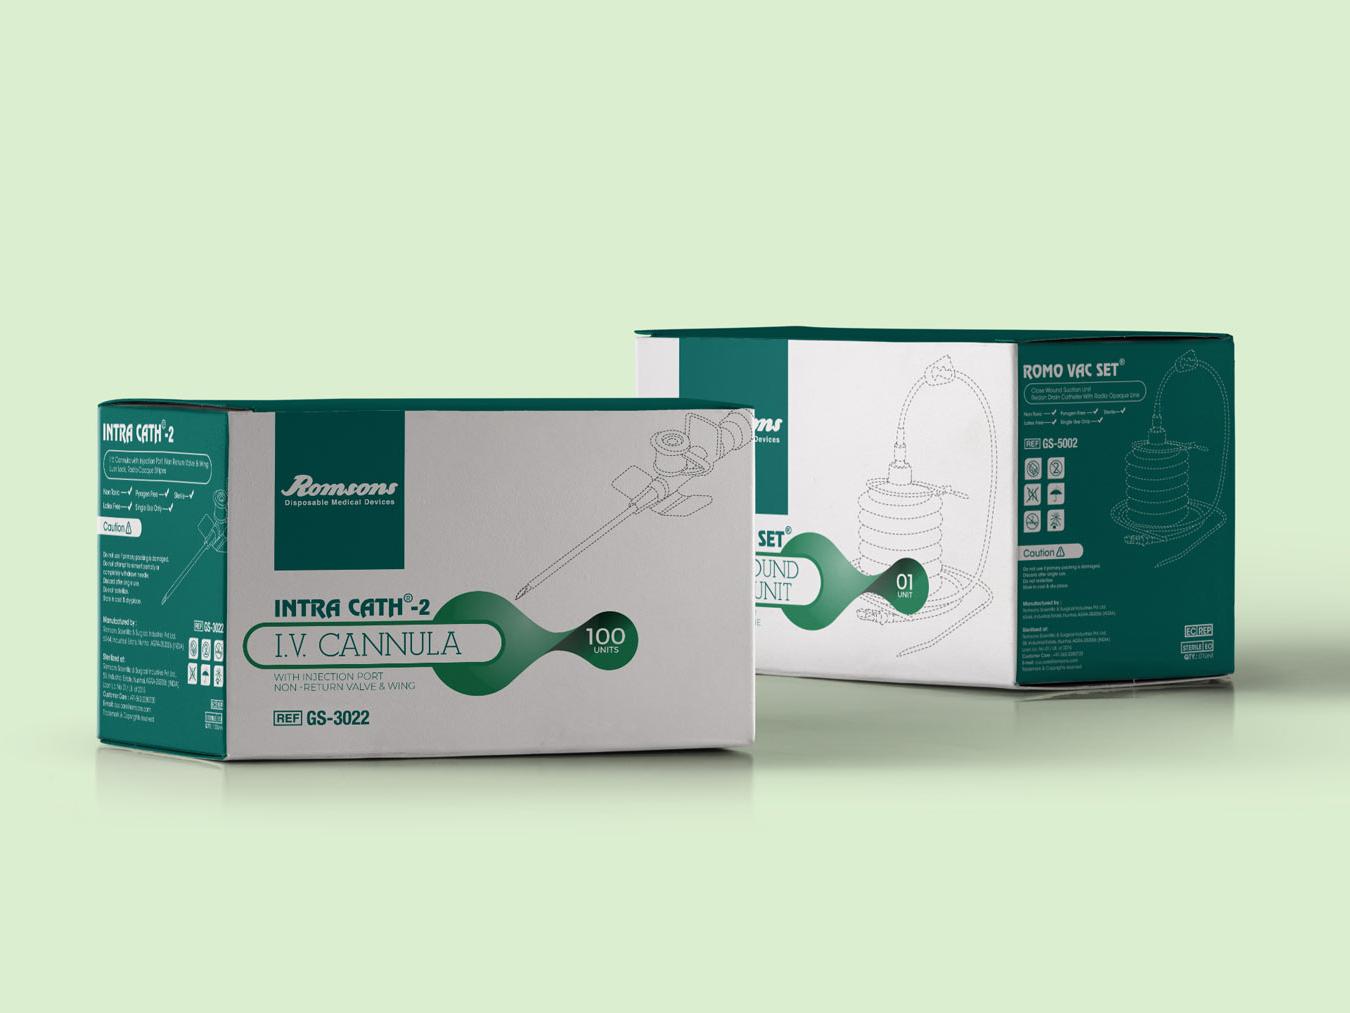 Pharma Packaging Design packagingdesign productdesign branding medical device packaging pharmaceuticals packaging design medical packaging design pharma packaging design